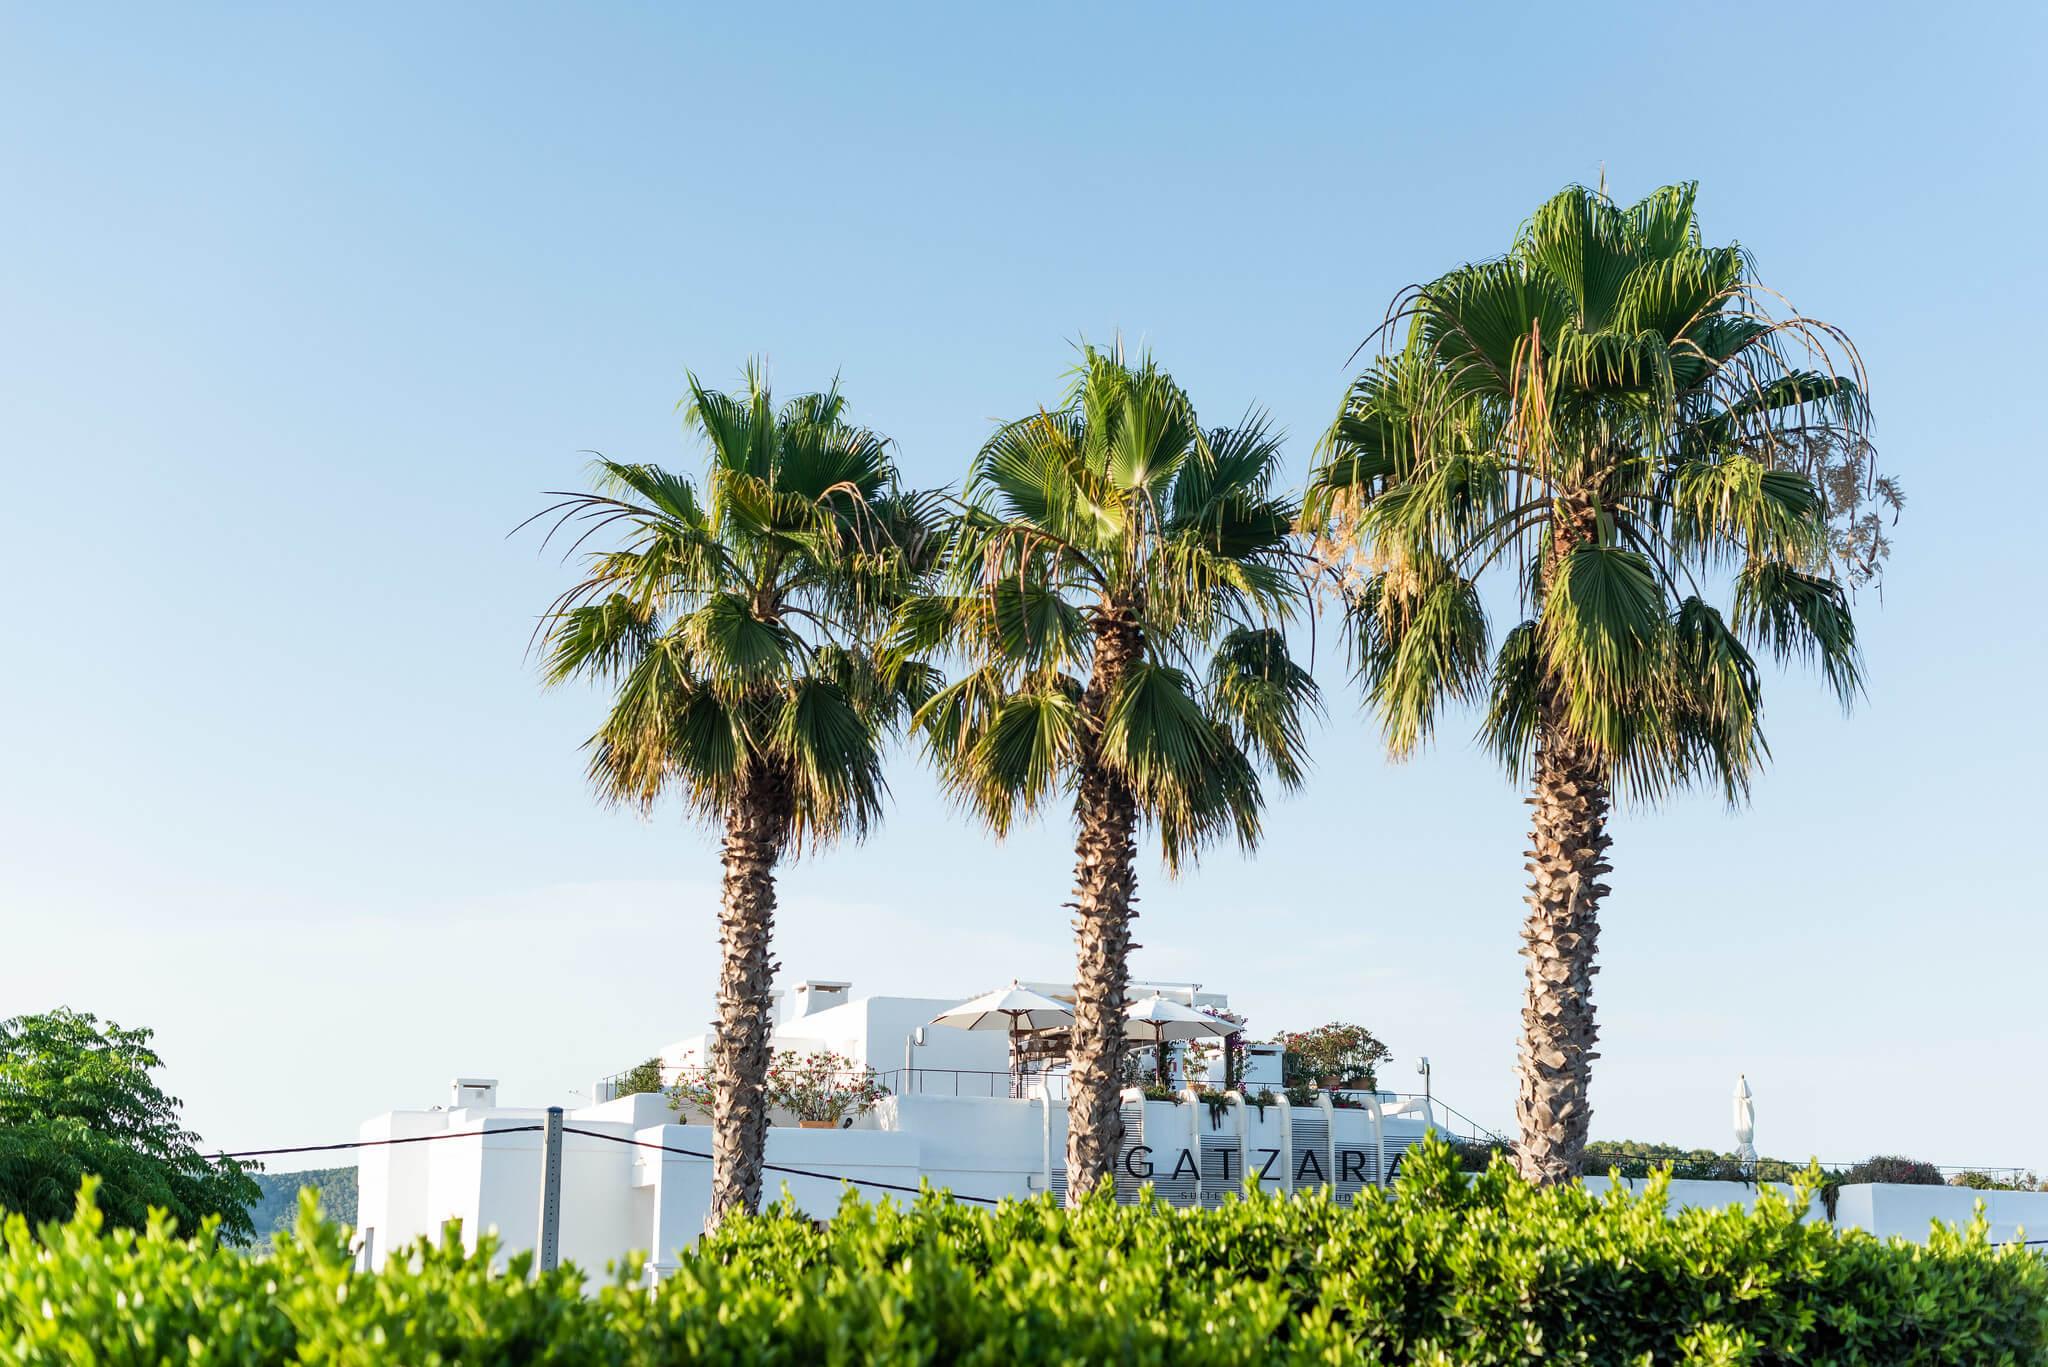 https://www.white-ibiza.com/wp-content/uploads/2020/05/white-ibiza-villas-where-to-buy-santa-gertrudis-04.jpg